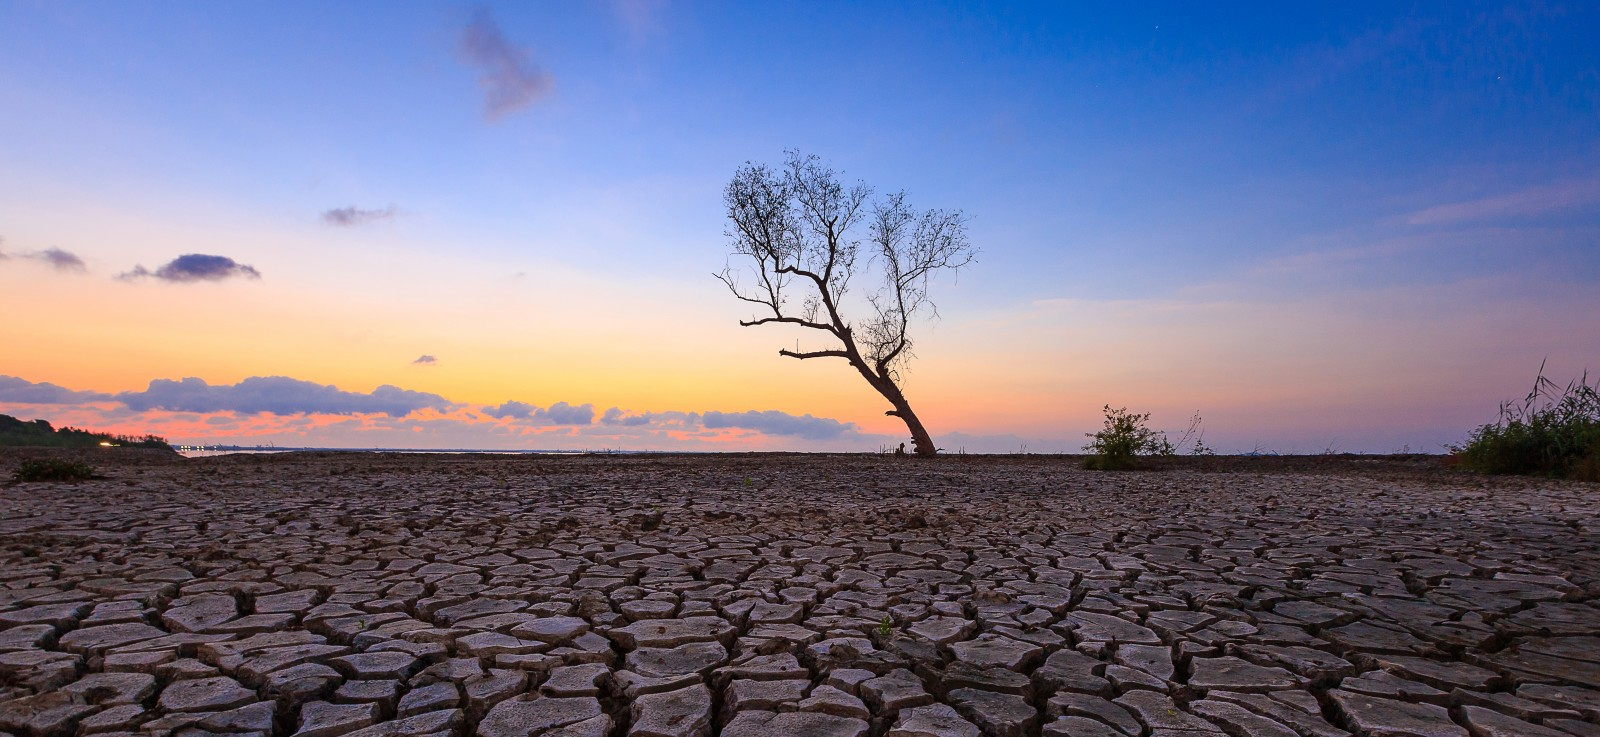 CLIMWAR_cracked earth drought © Chaisit Rattanachusri / Shutterstock